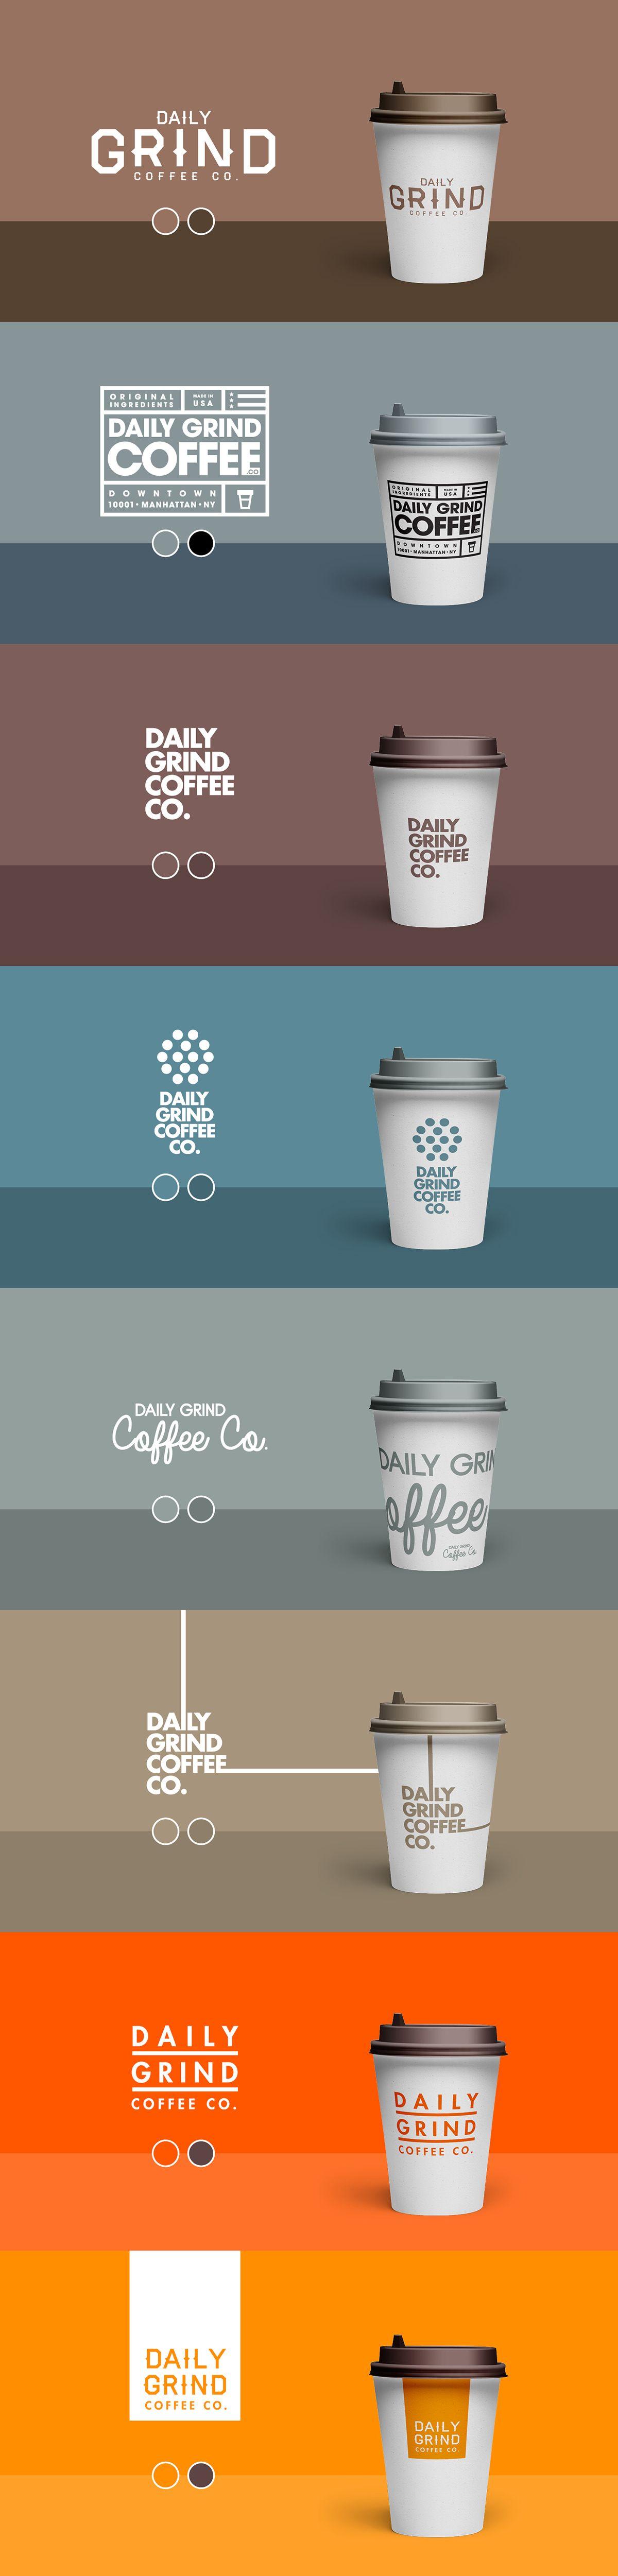 Daily grind coffee co on behance coffee shop logo